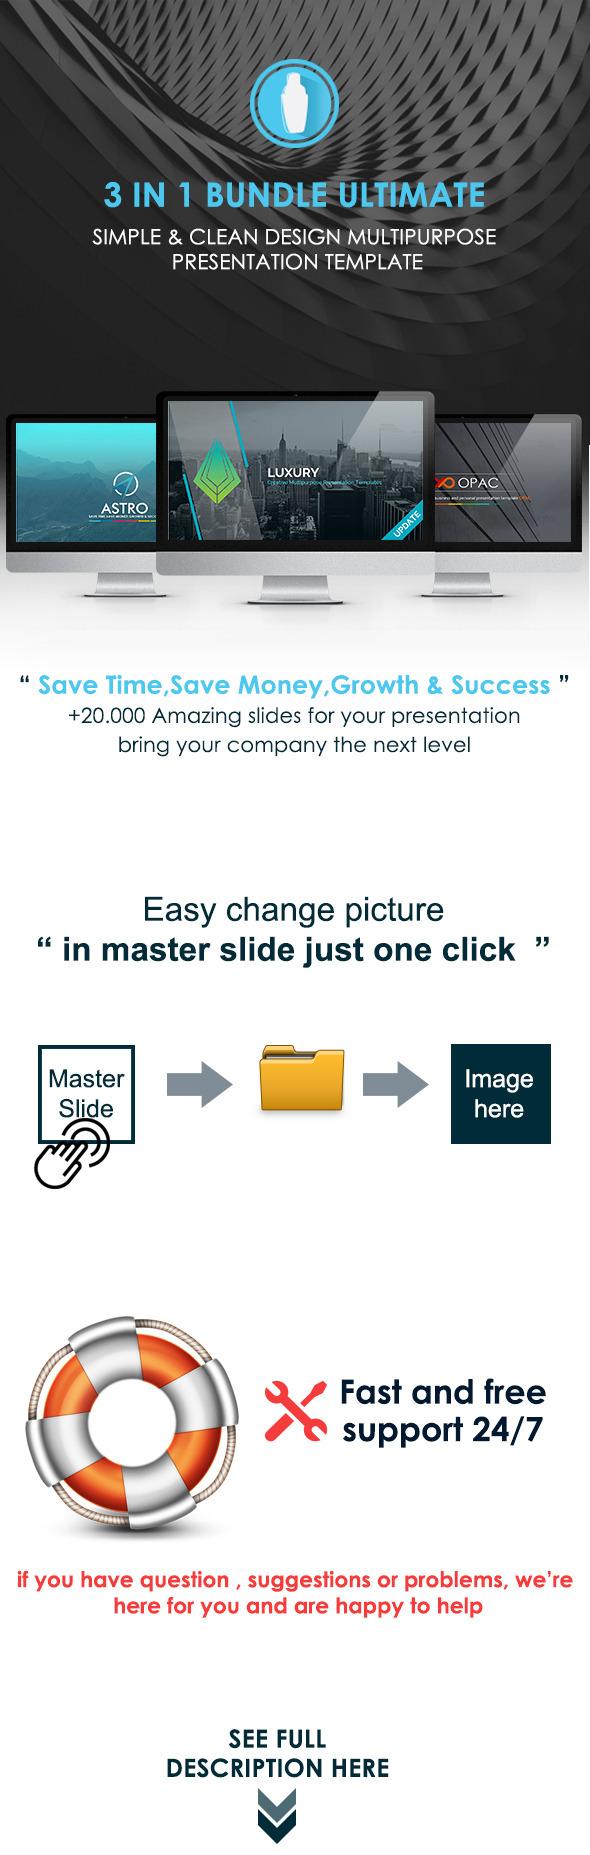 Ultimate Bundle Multipurpose Presentation Template - Creative PowerPoint Templates